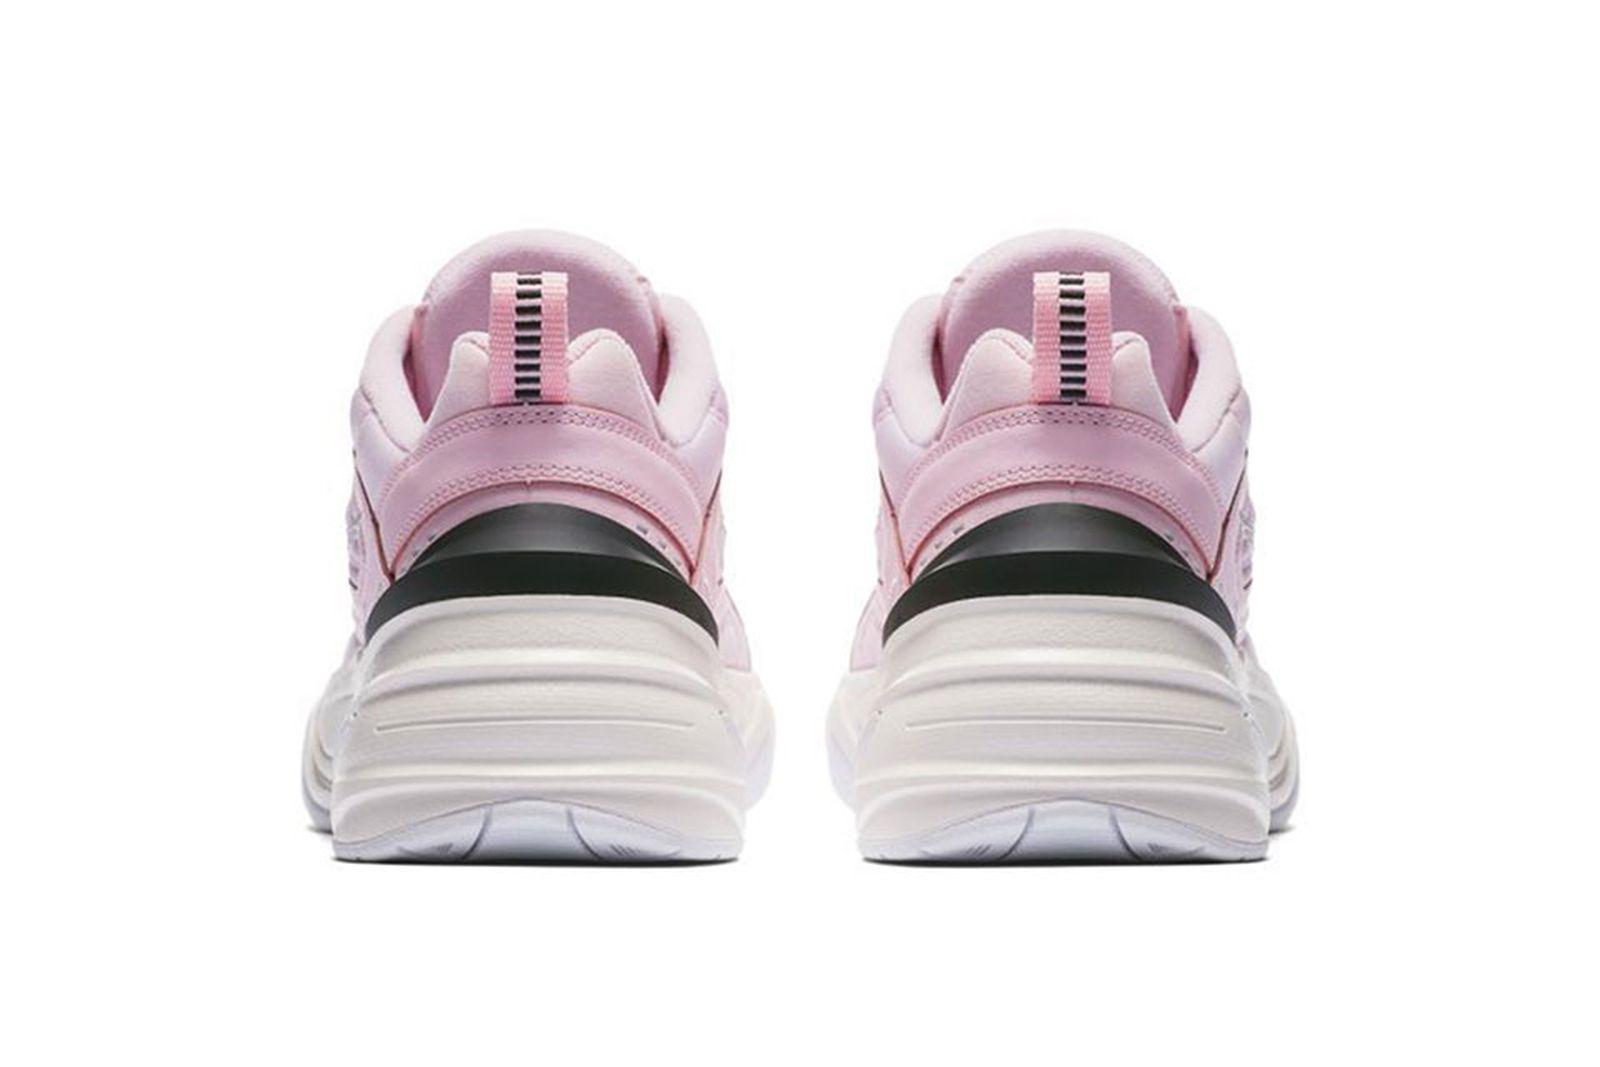 nike-wmns-m2k-tekno-pink-foam-release-date-price-04